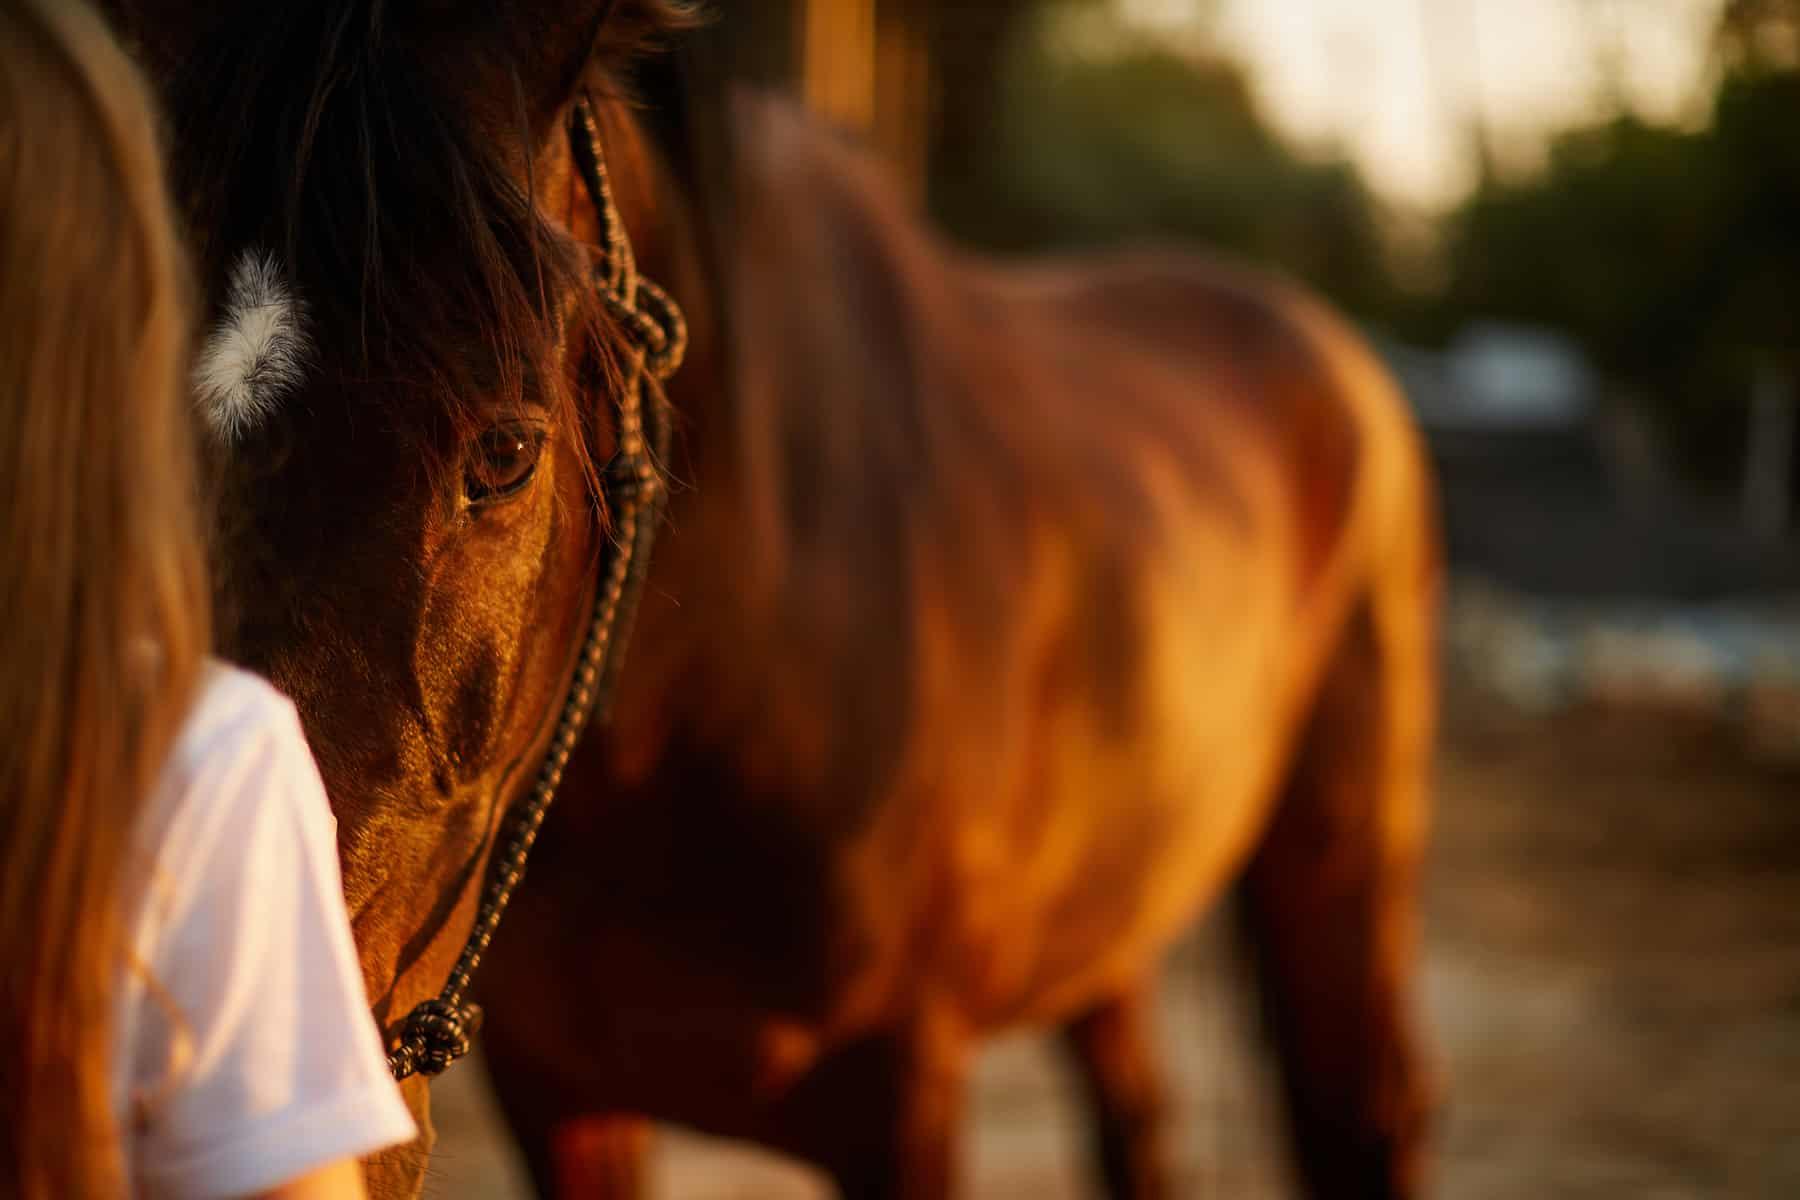 Post-Concussion Care for Equestrians